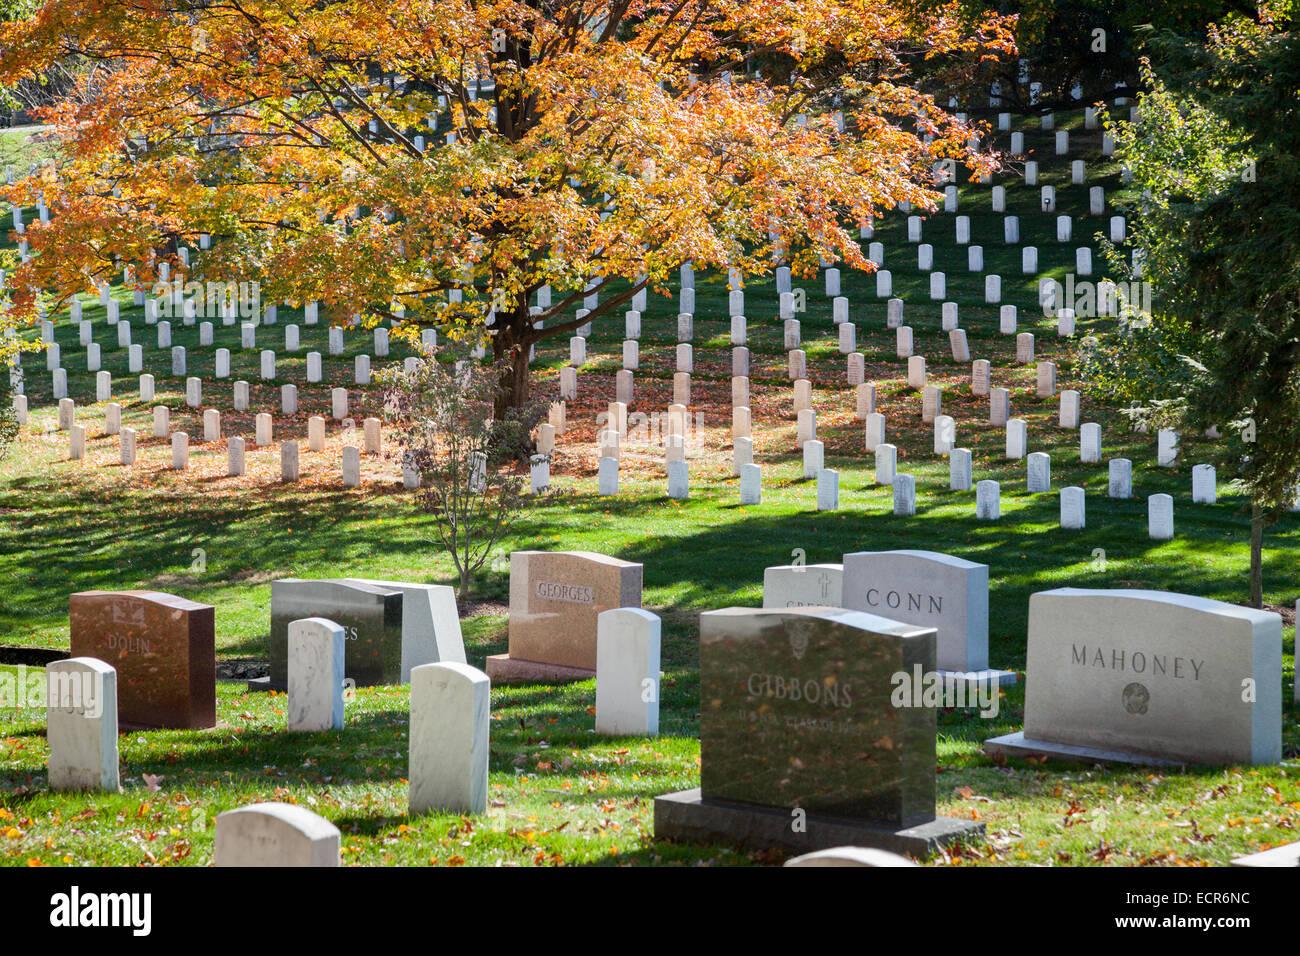 Arlington National Cemetery in autumn foliage, Virginia - Stock Image